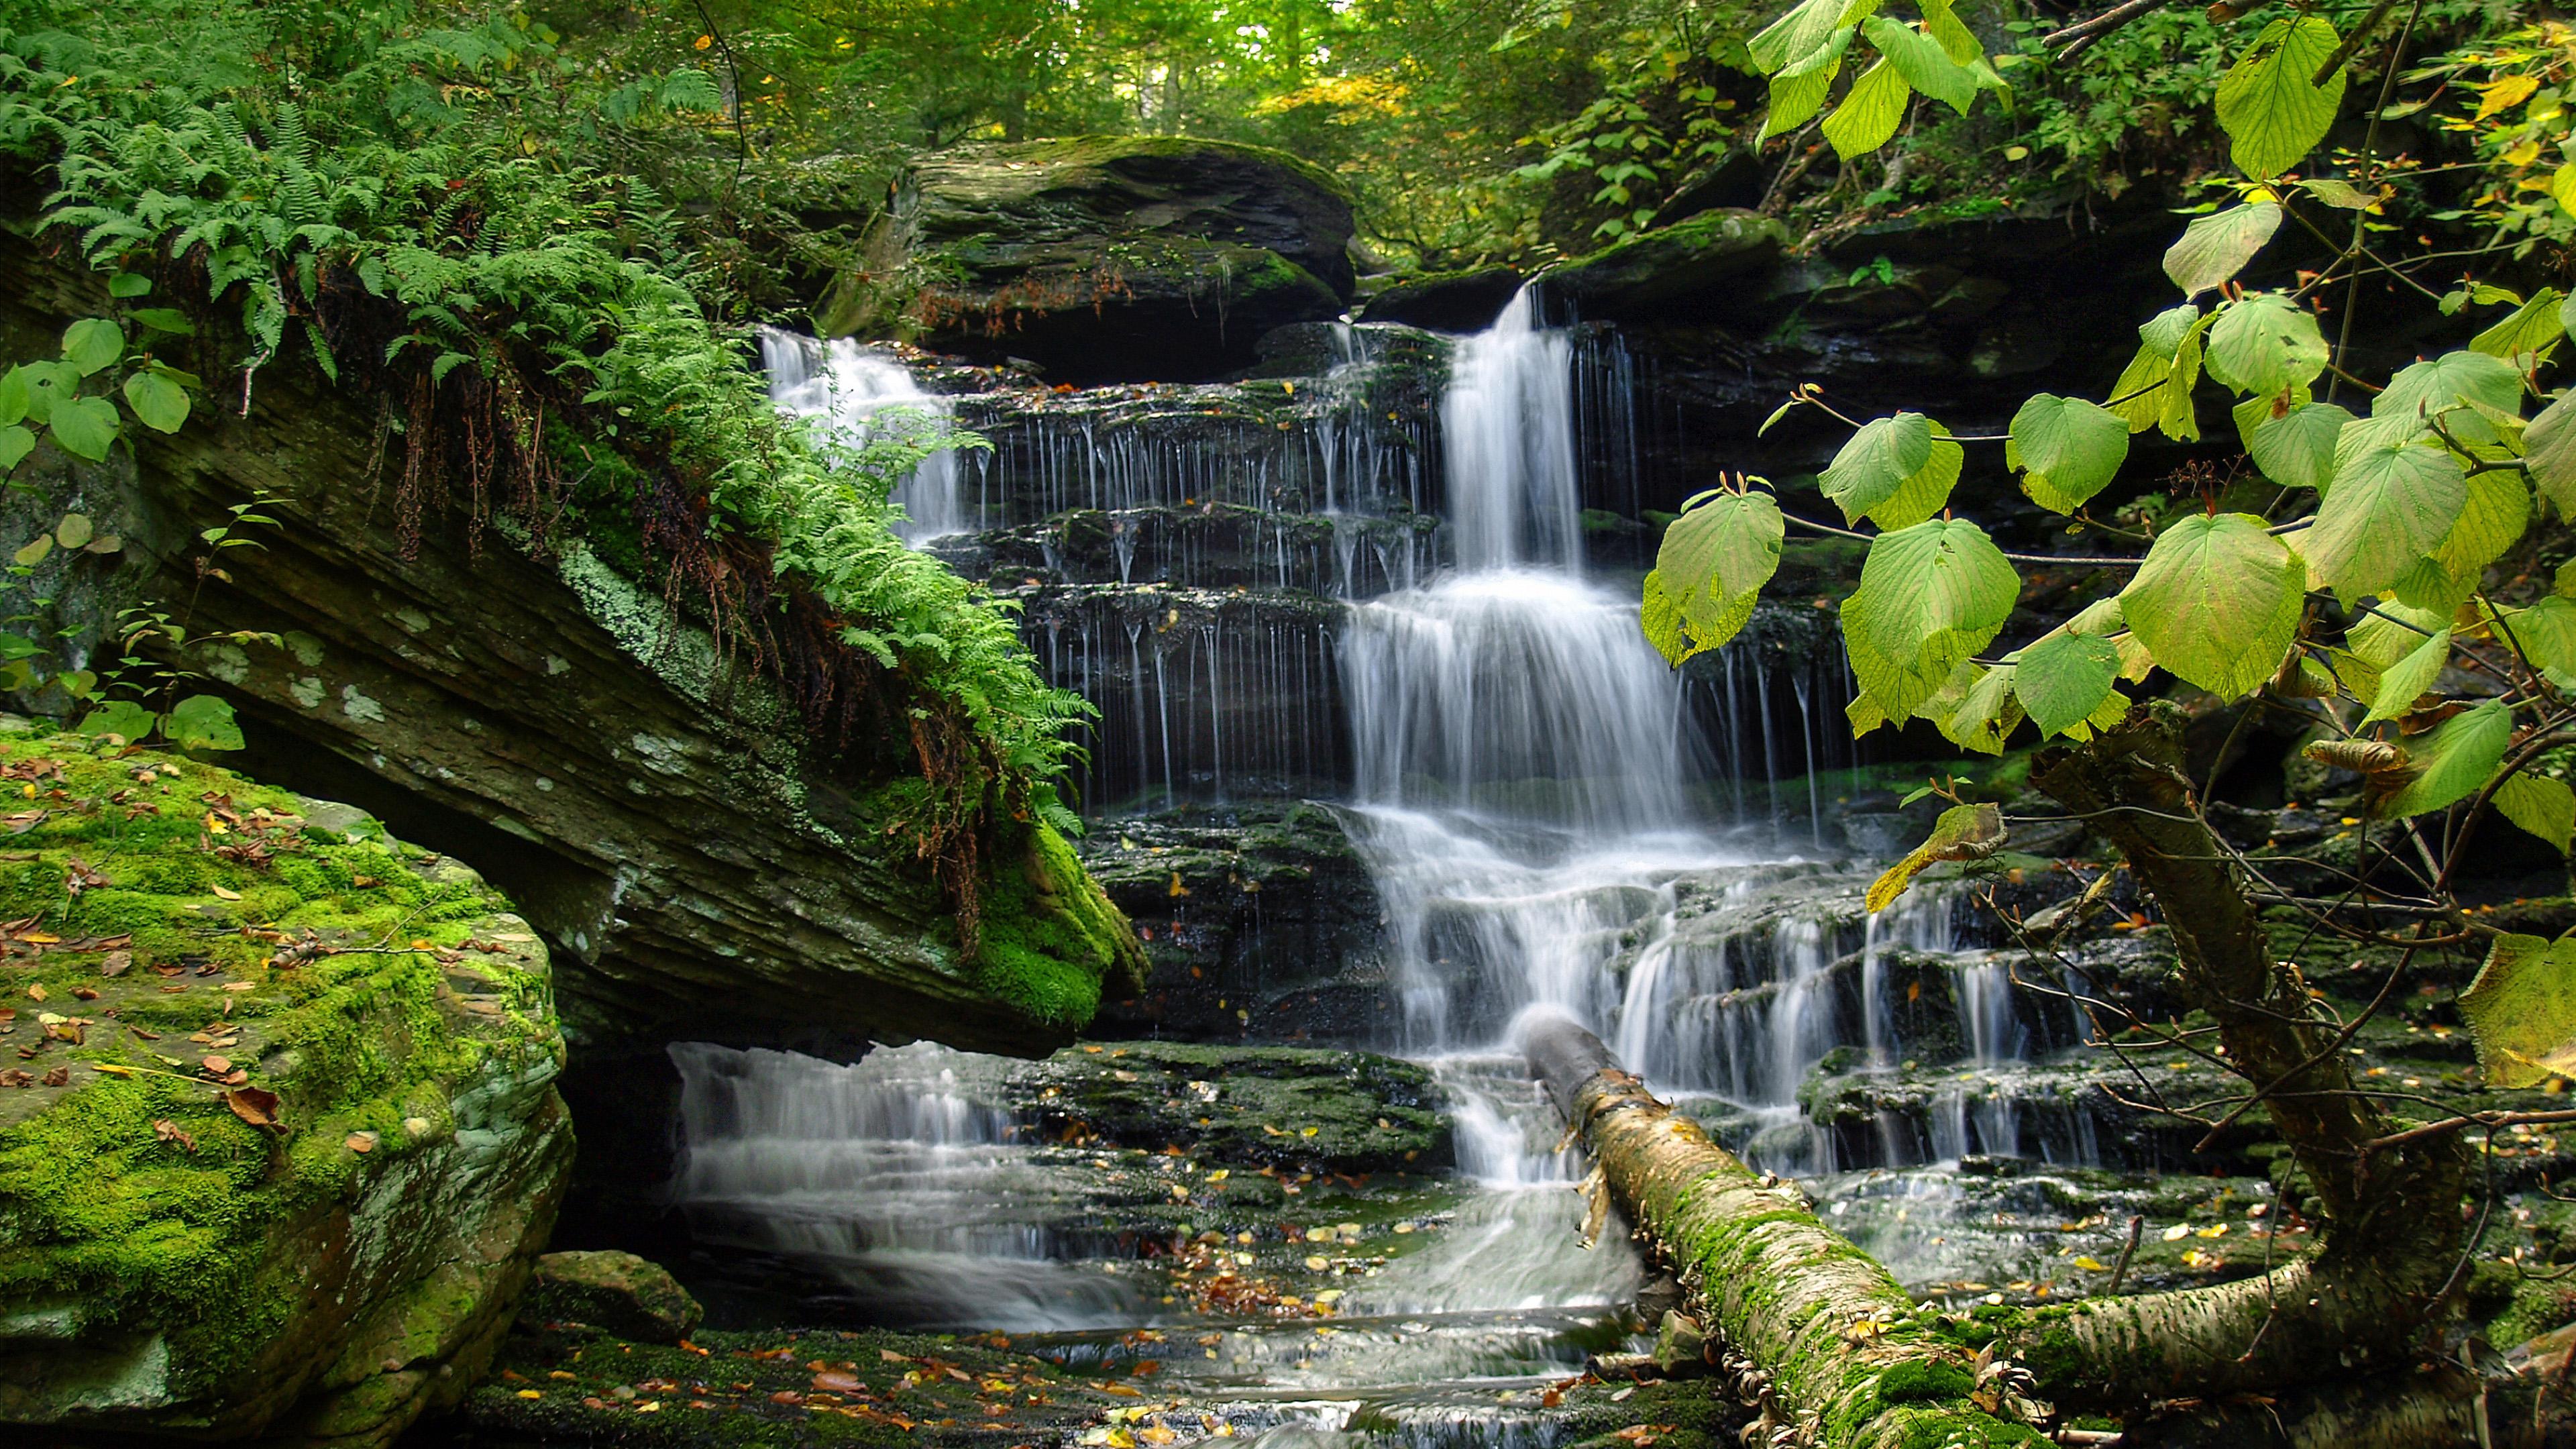 природа водопад деревья онлайн